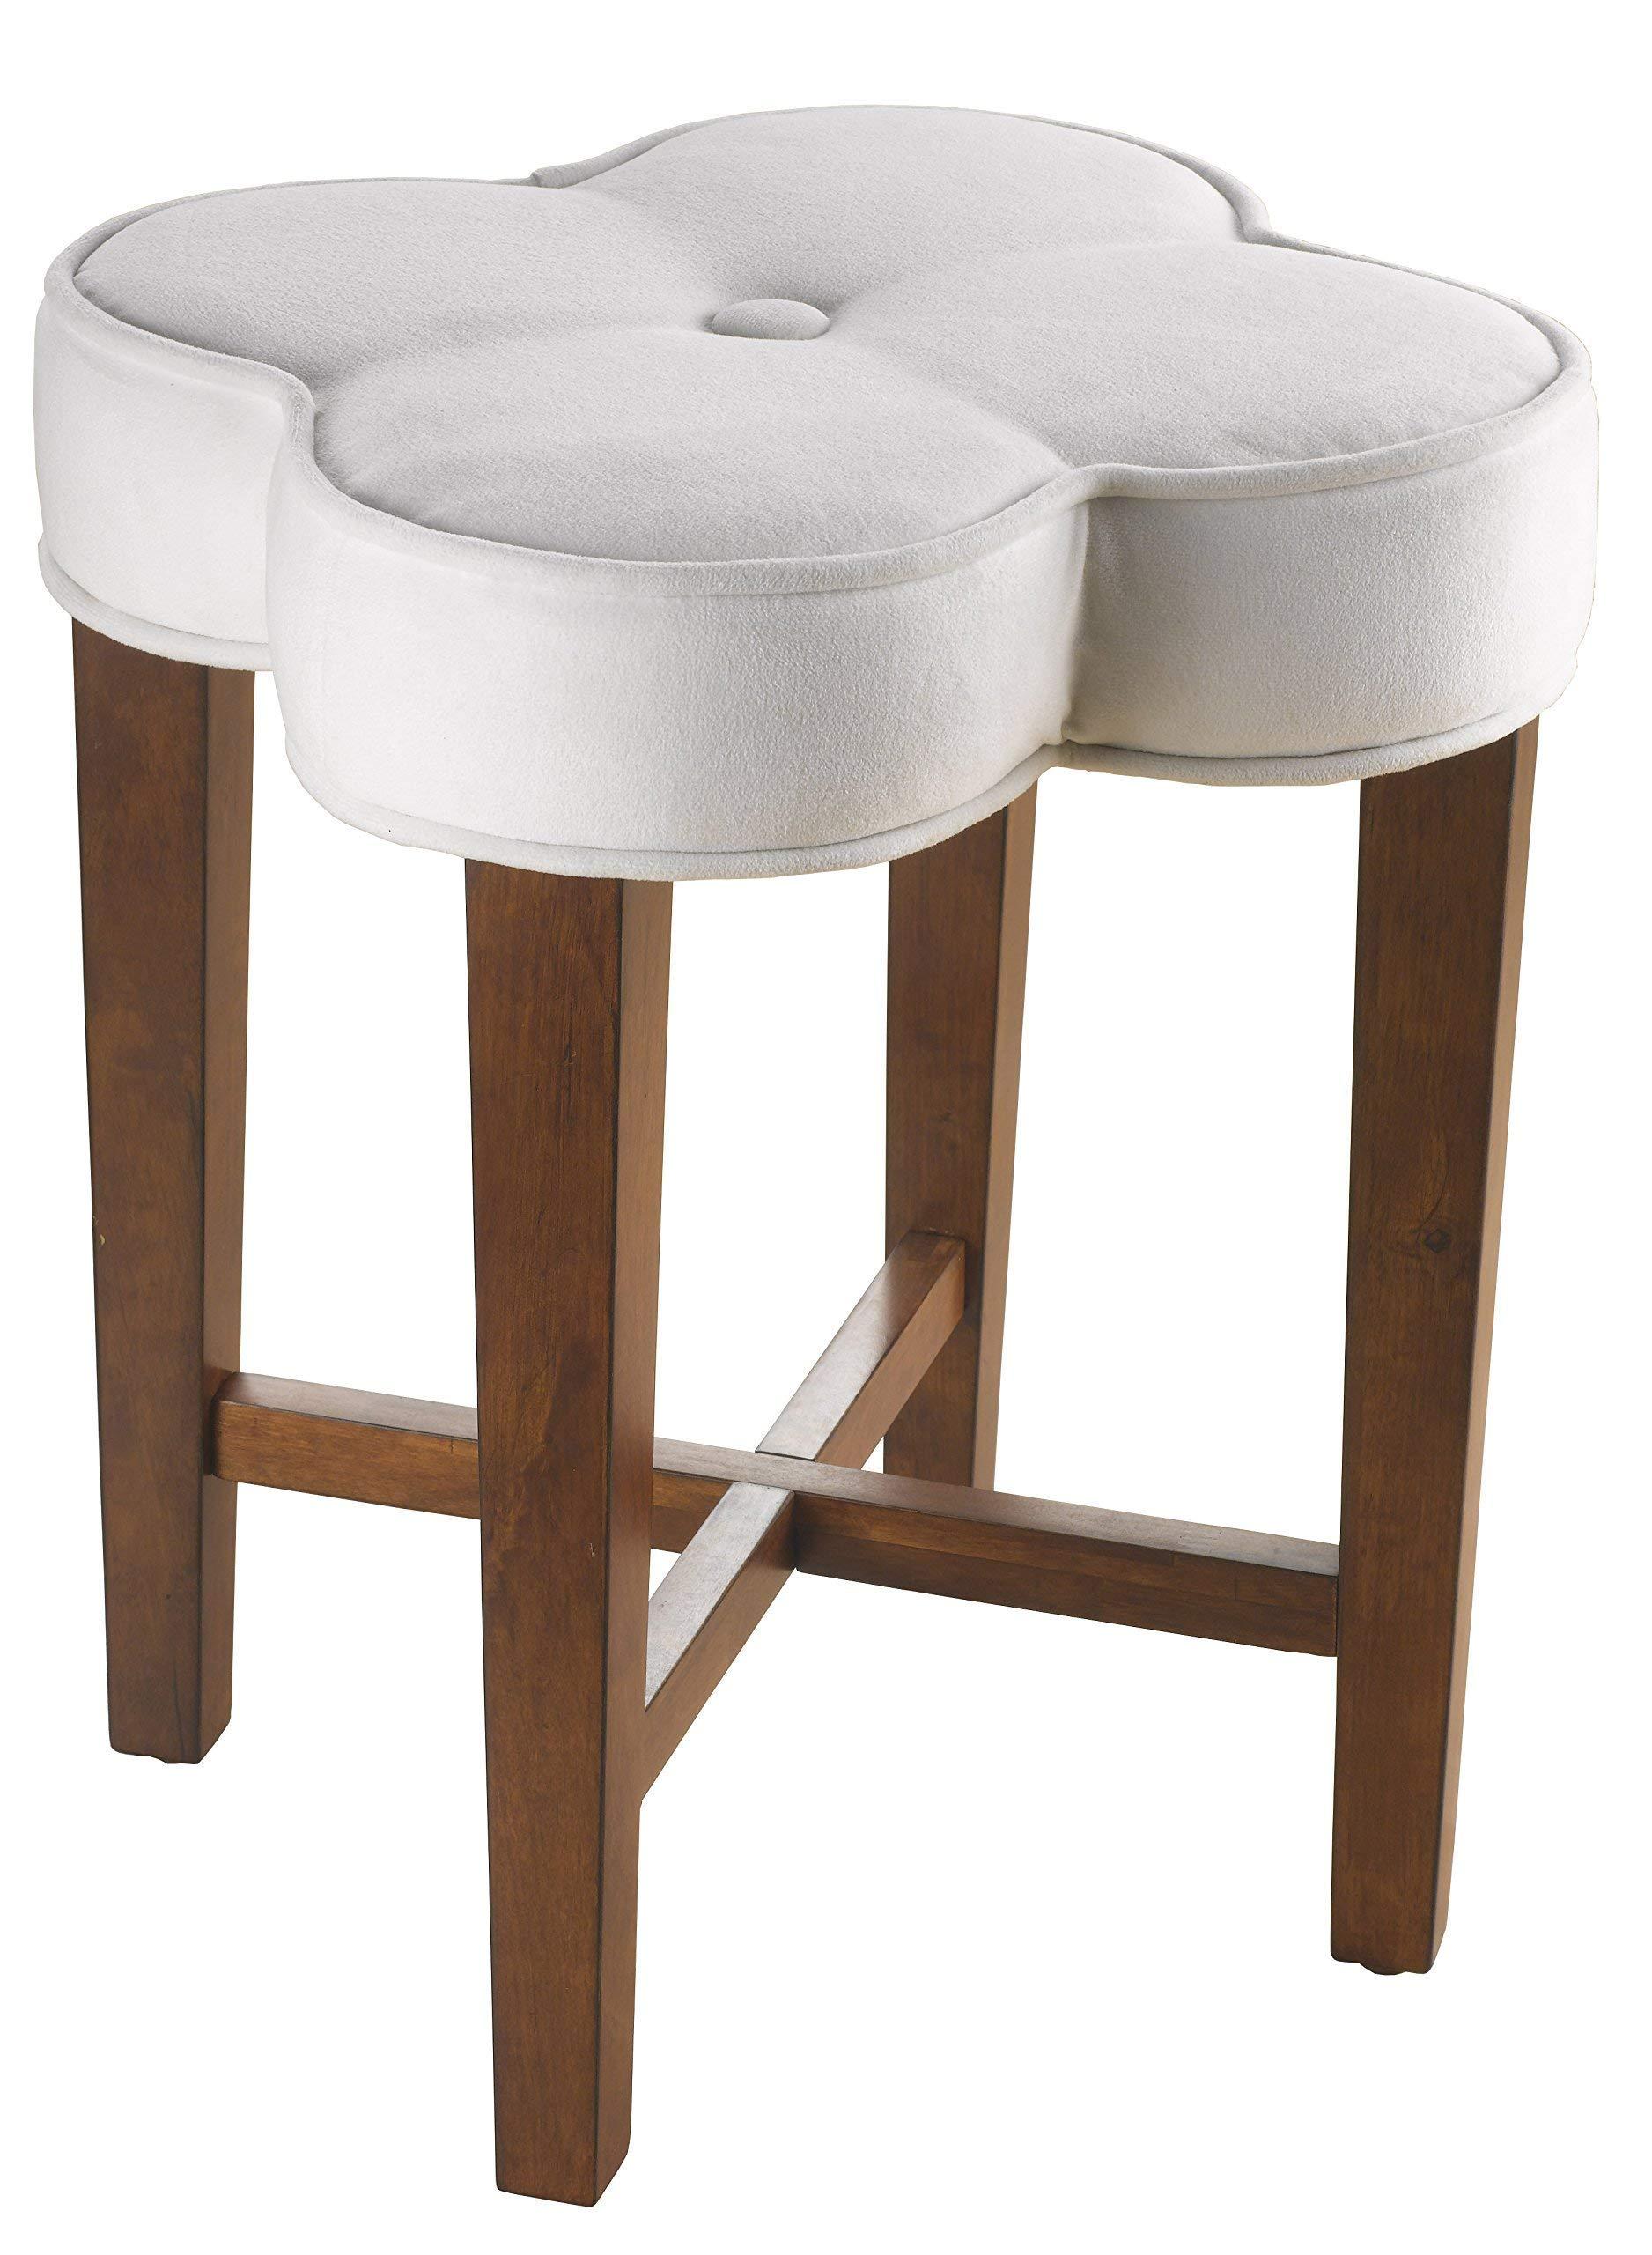 Hillsdale Furniture 50958 Clover Vanity Stool, White